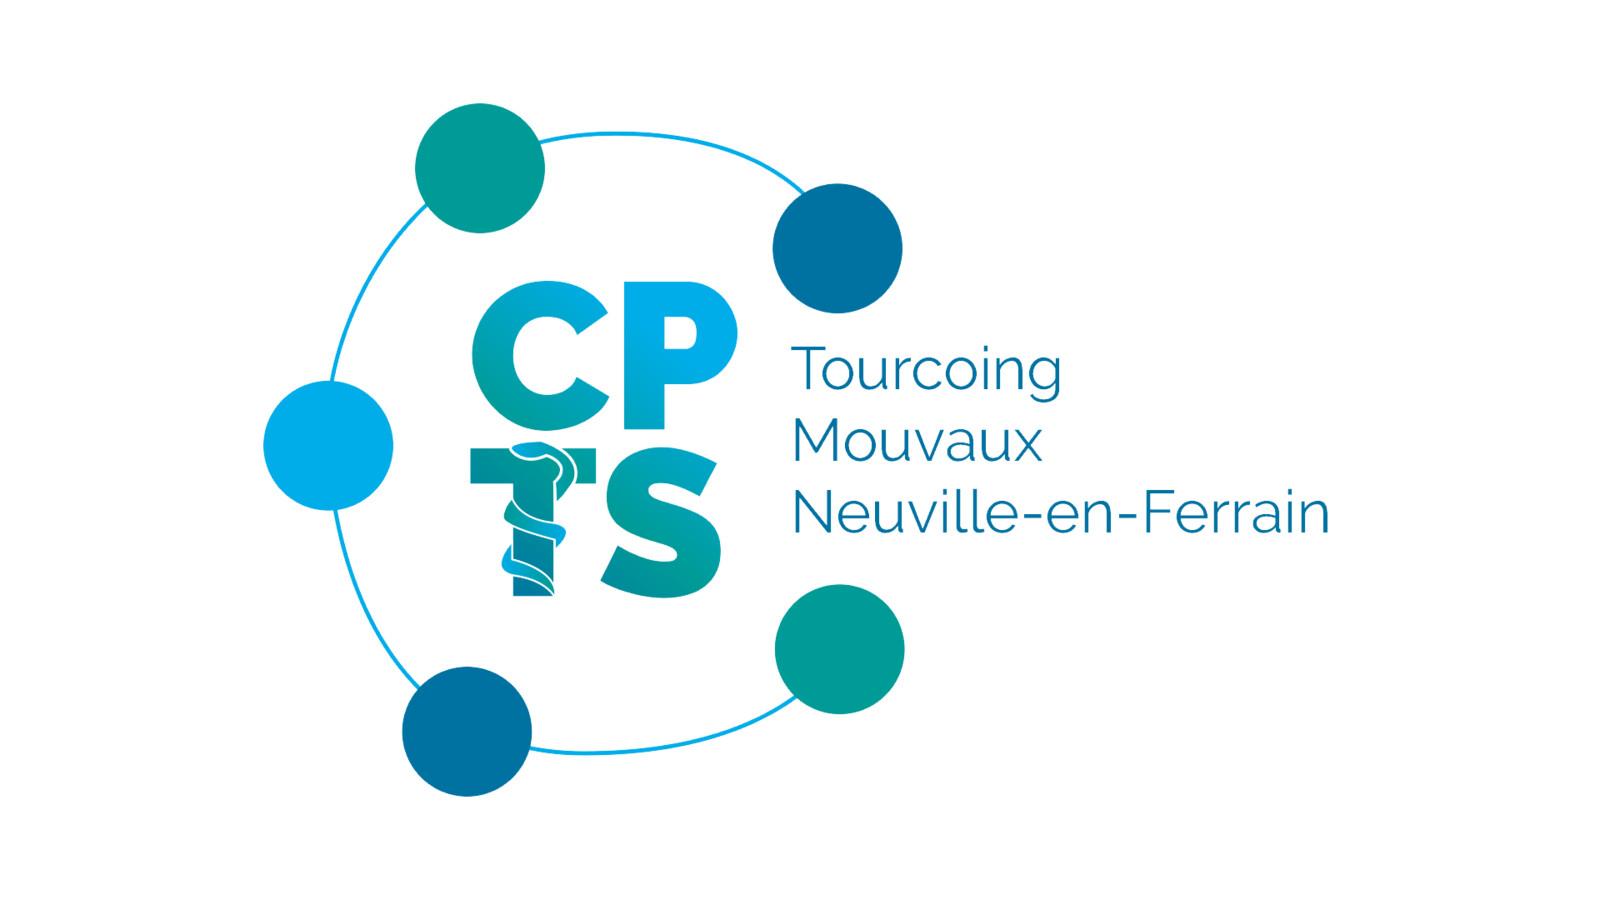 LOGO  / CPTS TOURCOING MOUVAUX NEUVILLE-EN-FERRAIN